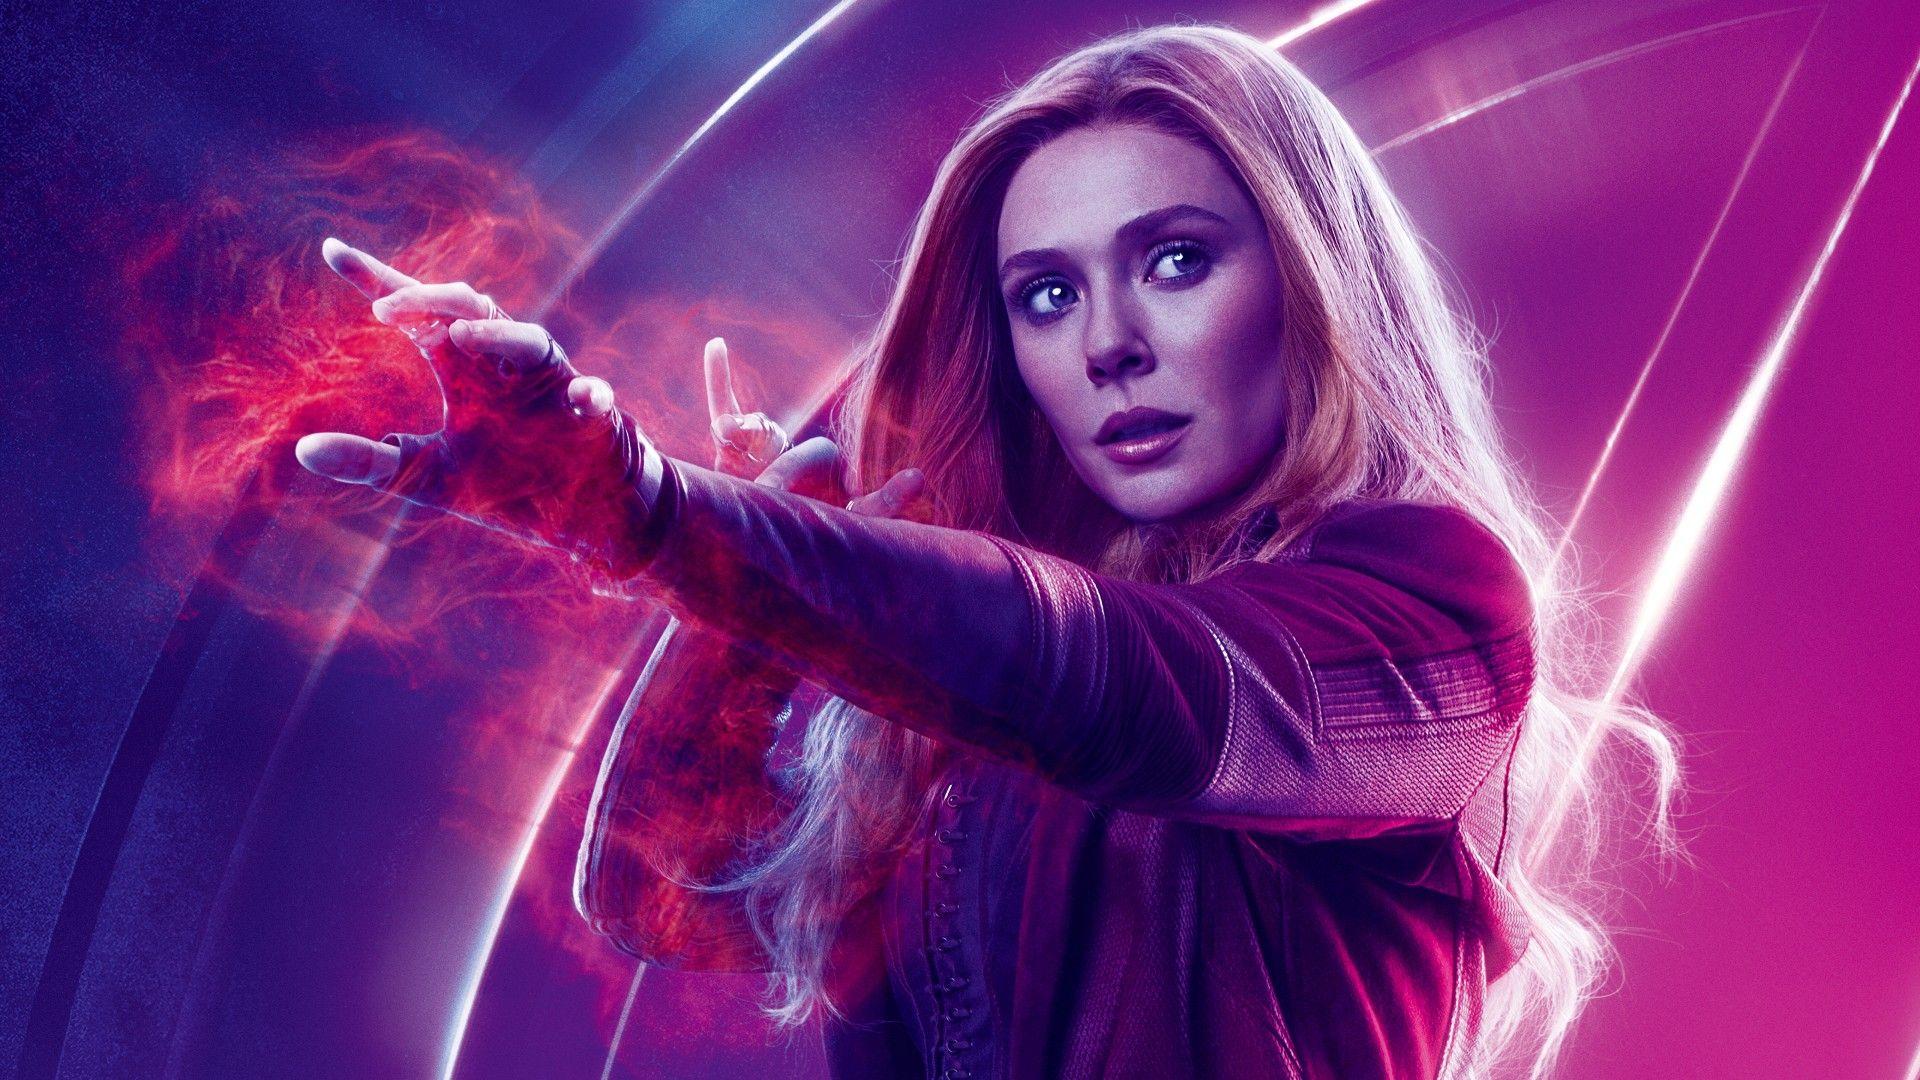 Scarlet Witch Elizabeth Olsen Avengers Wallpaper With Images